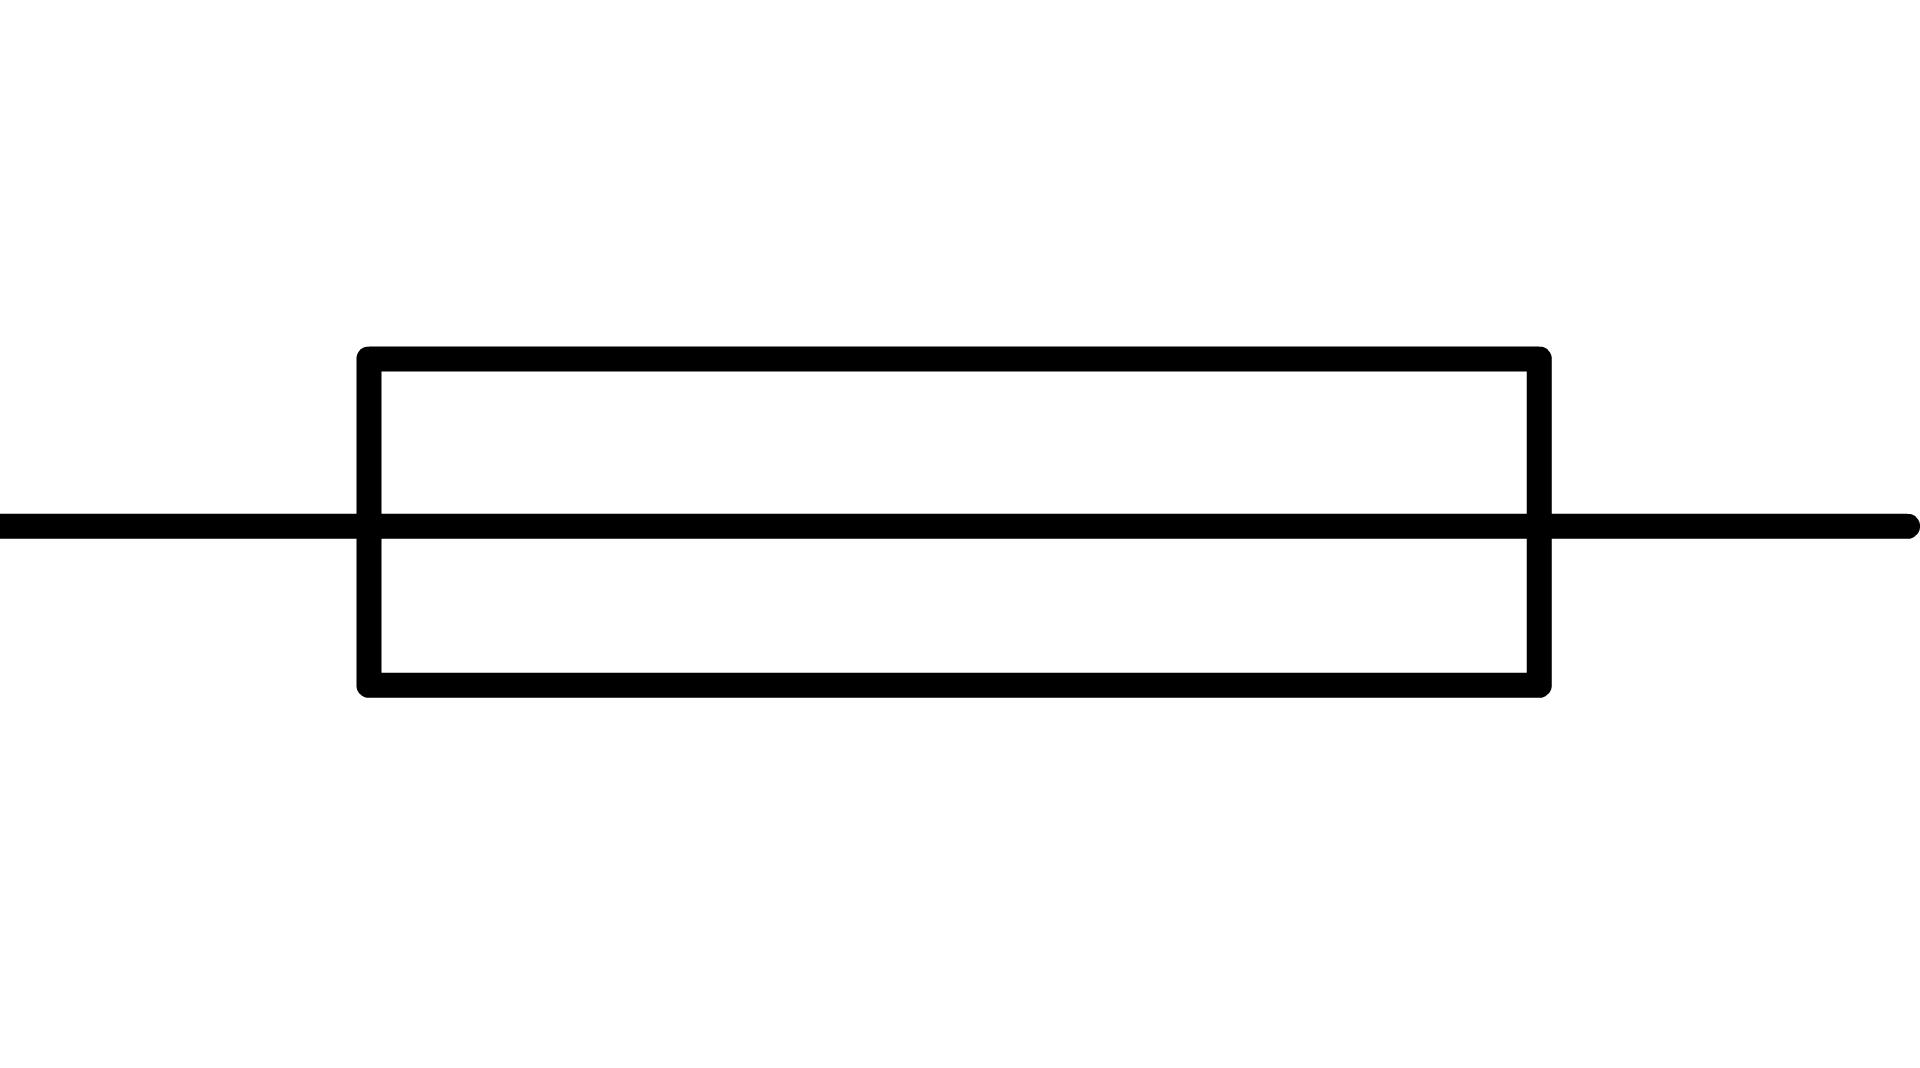 symboles normalis u00e9s   cours